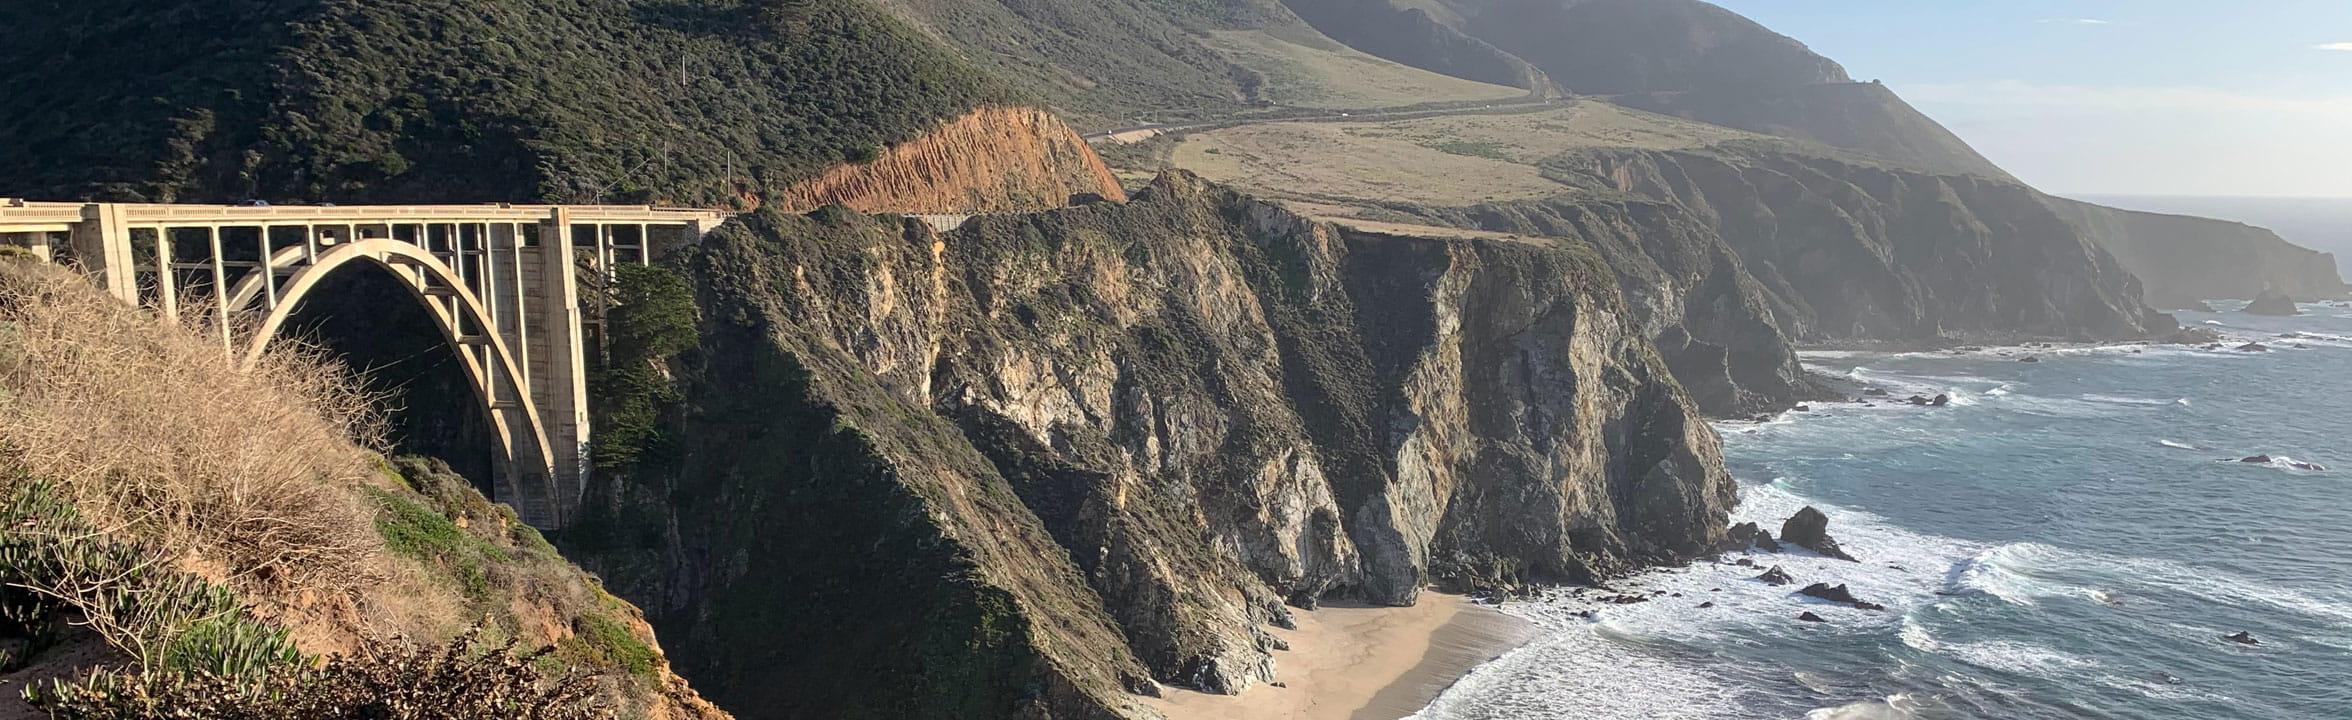 Carmel-by-the-Sea Location Hero Desktop Image